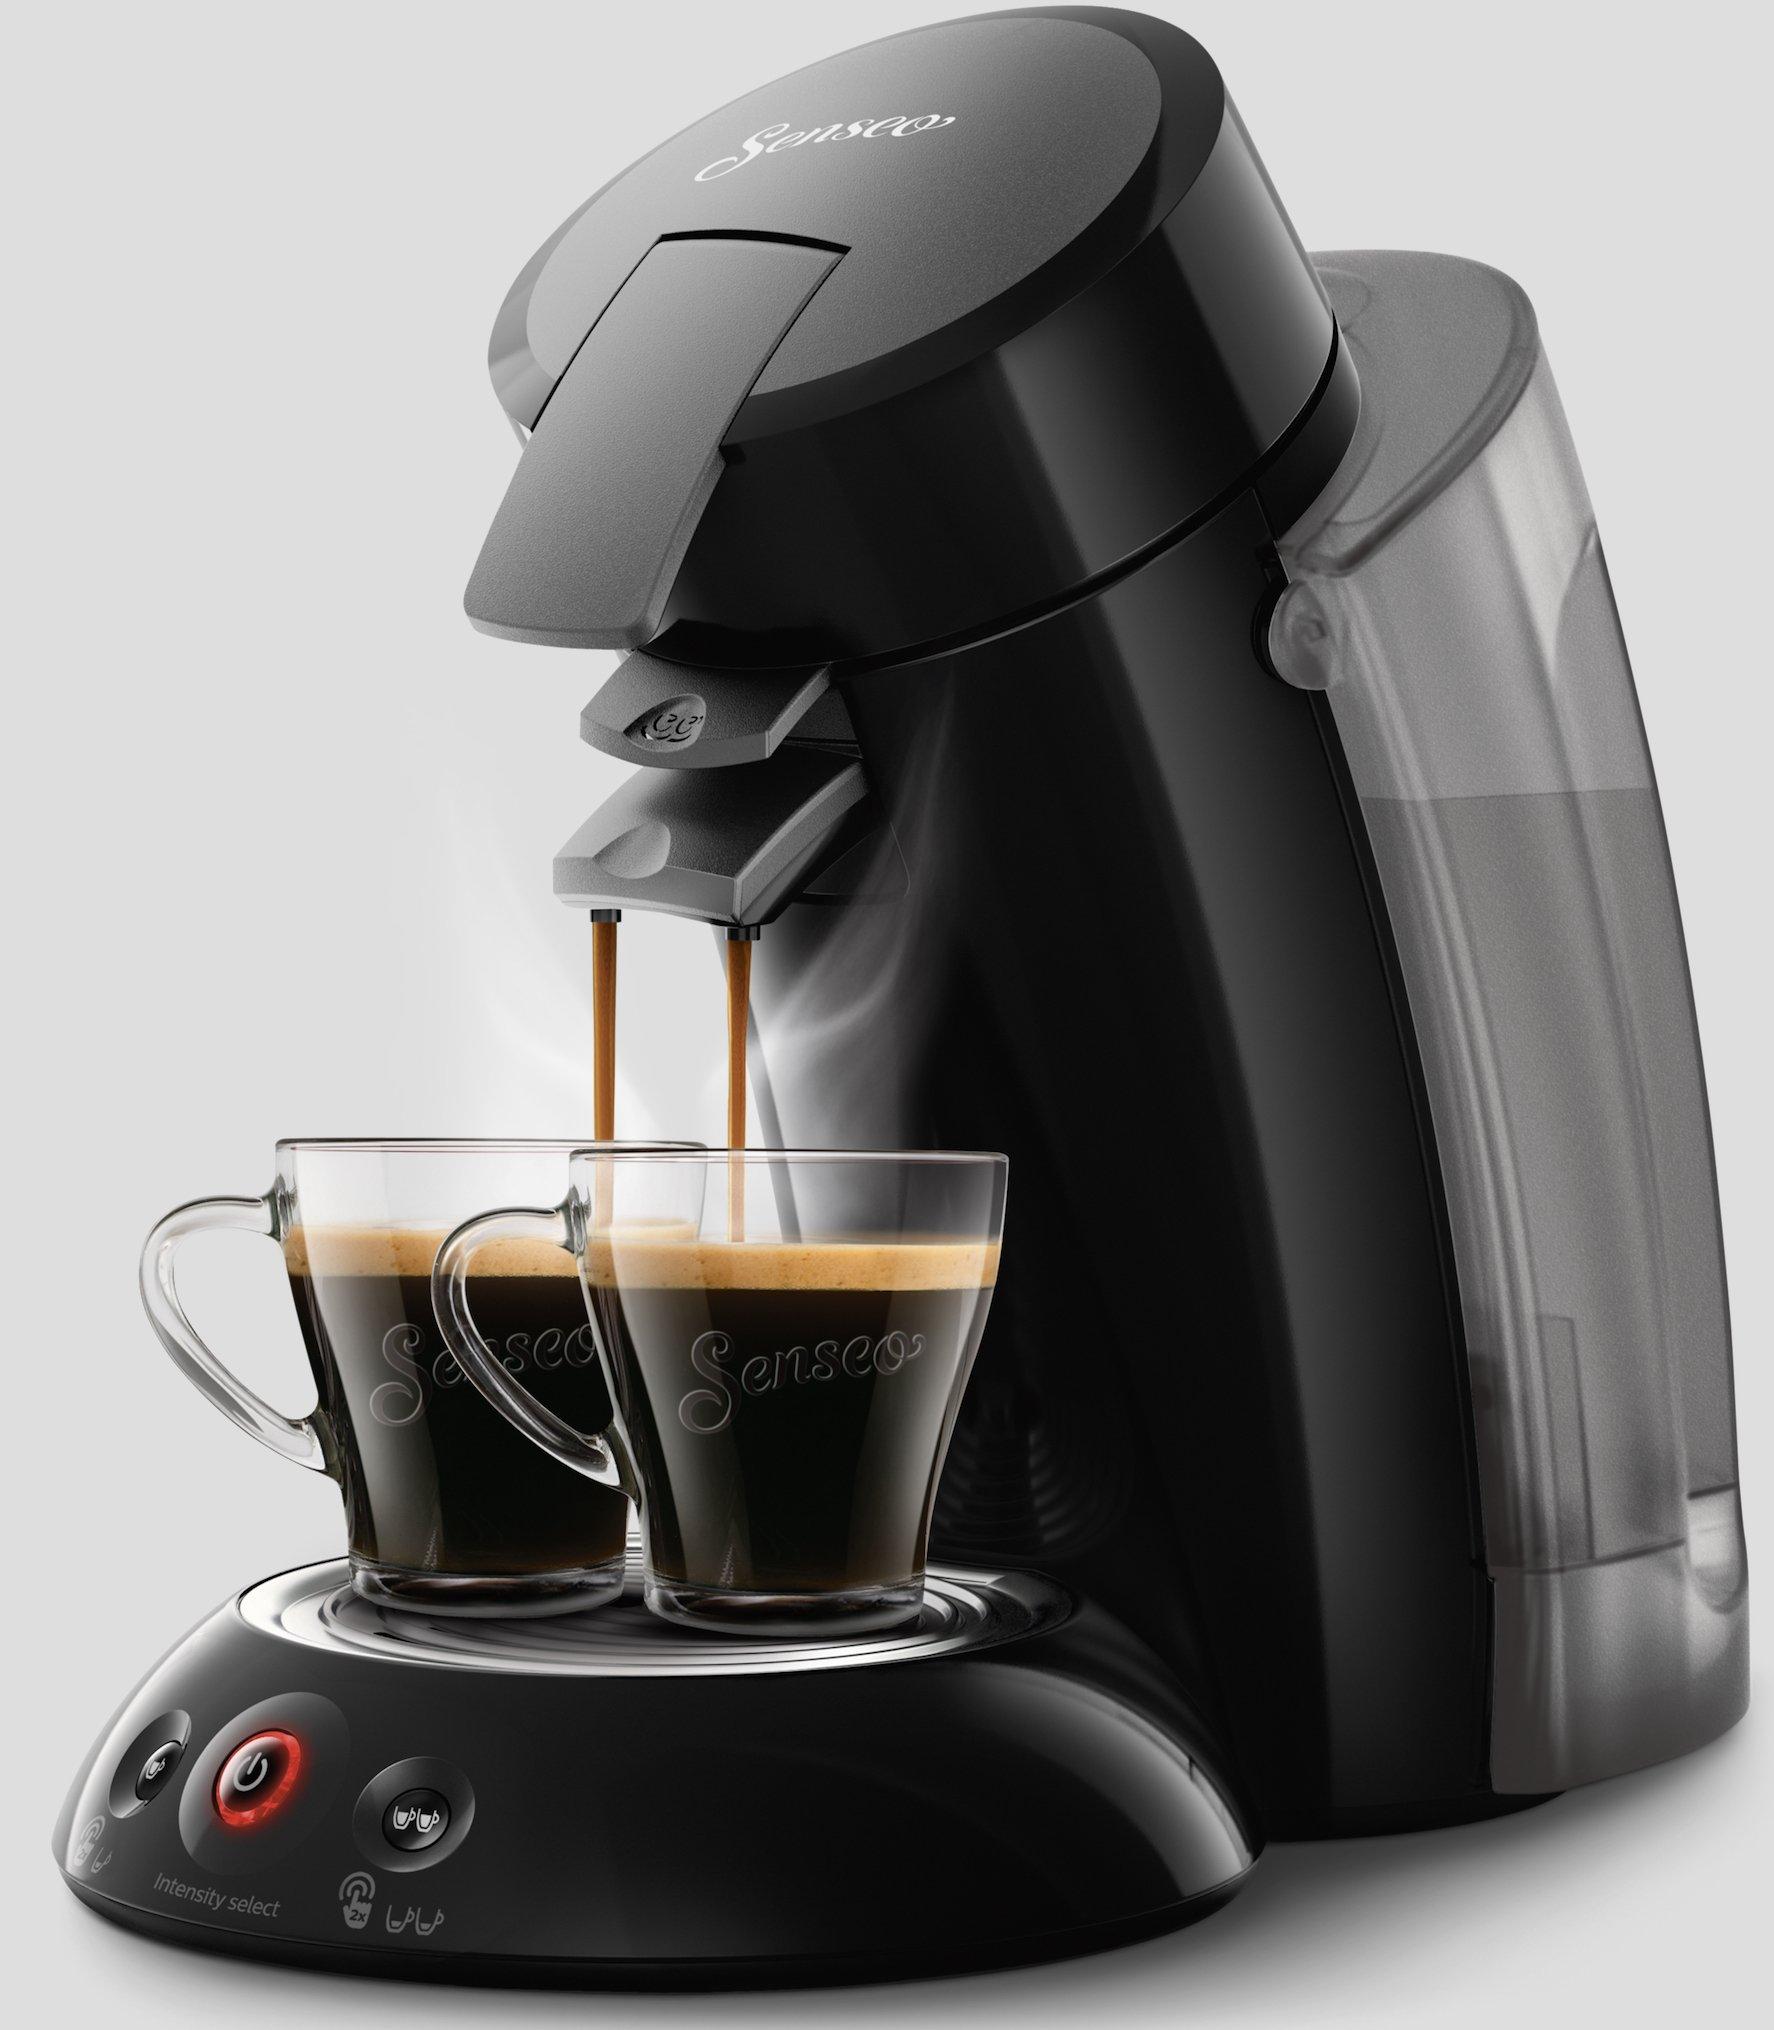 Senseo Original XL (2018 version) Coffee Maker by Philips, 7810/65